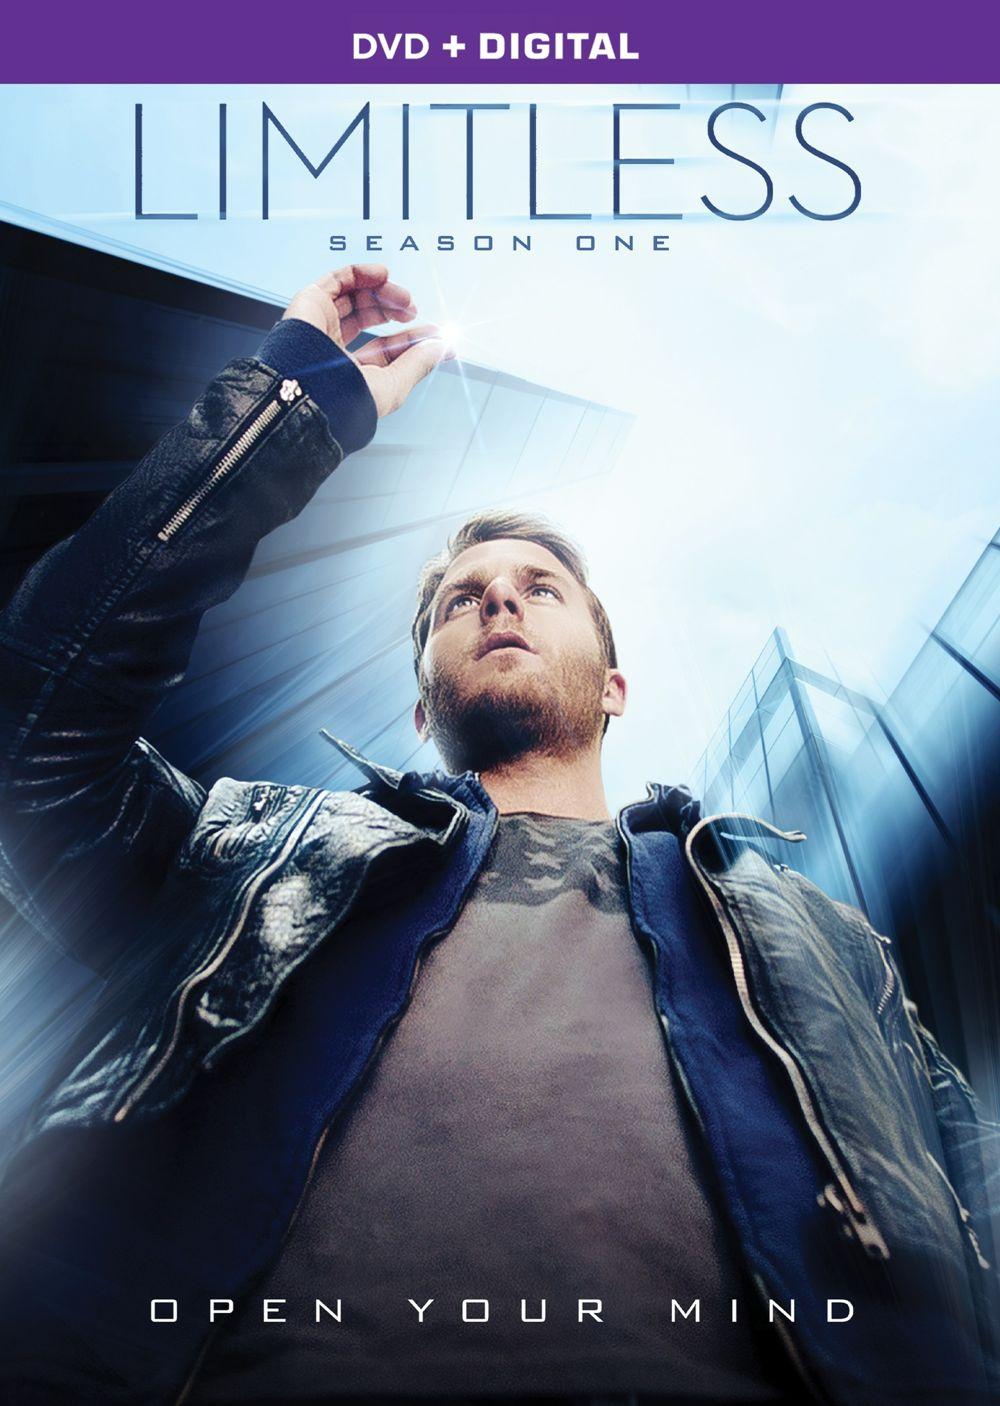 Limitless Season 1 DVD Cover